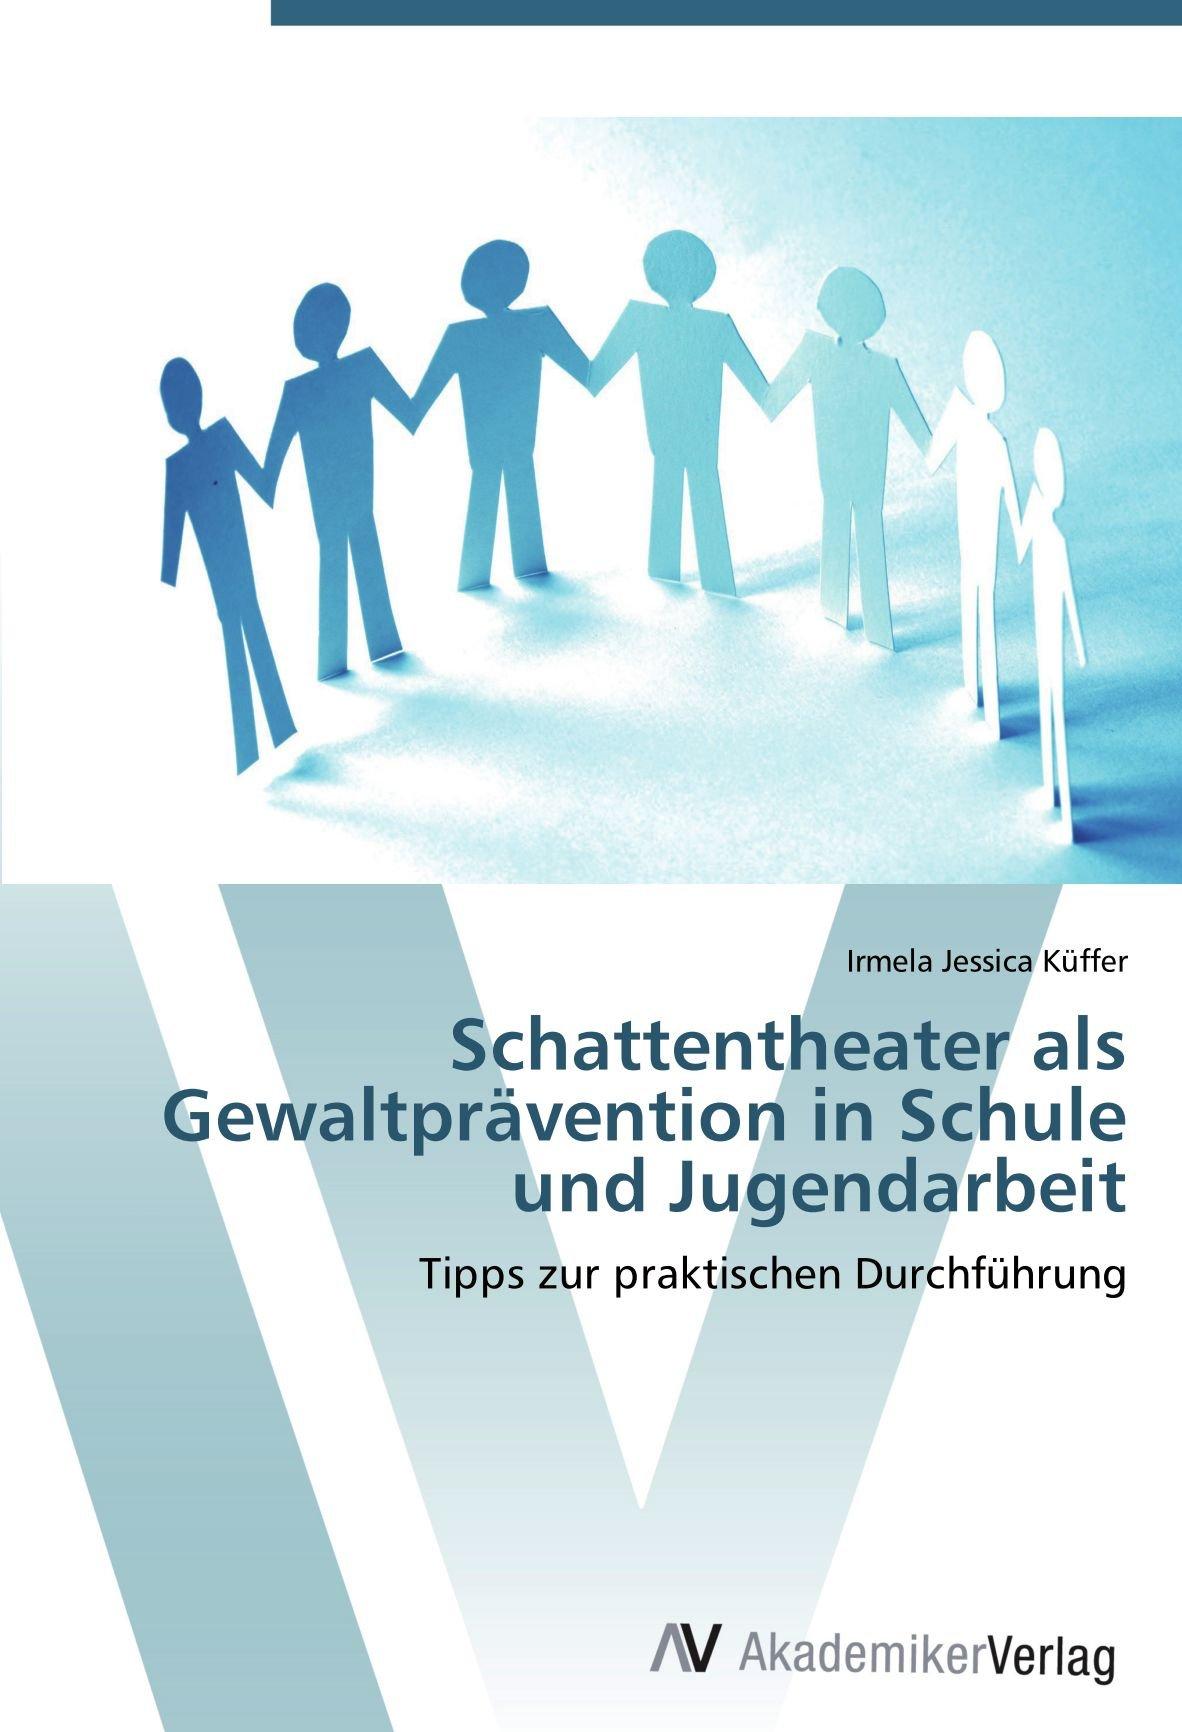 Download  PDF ePub ebook